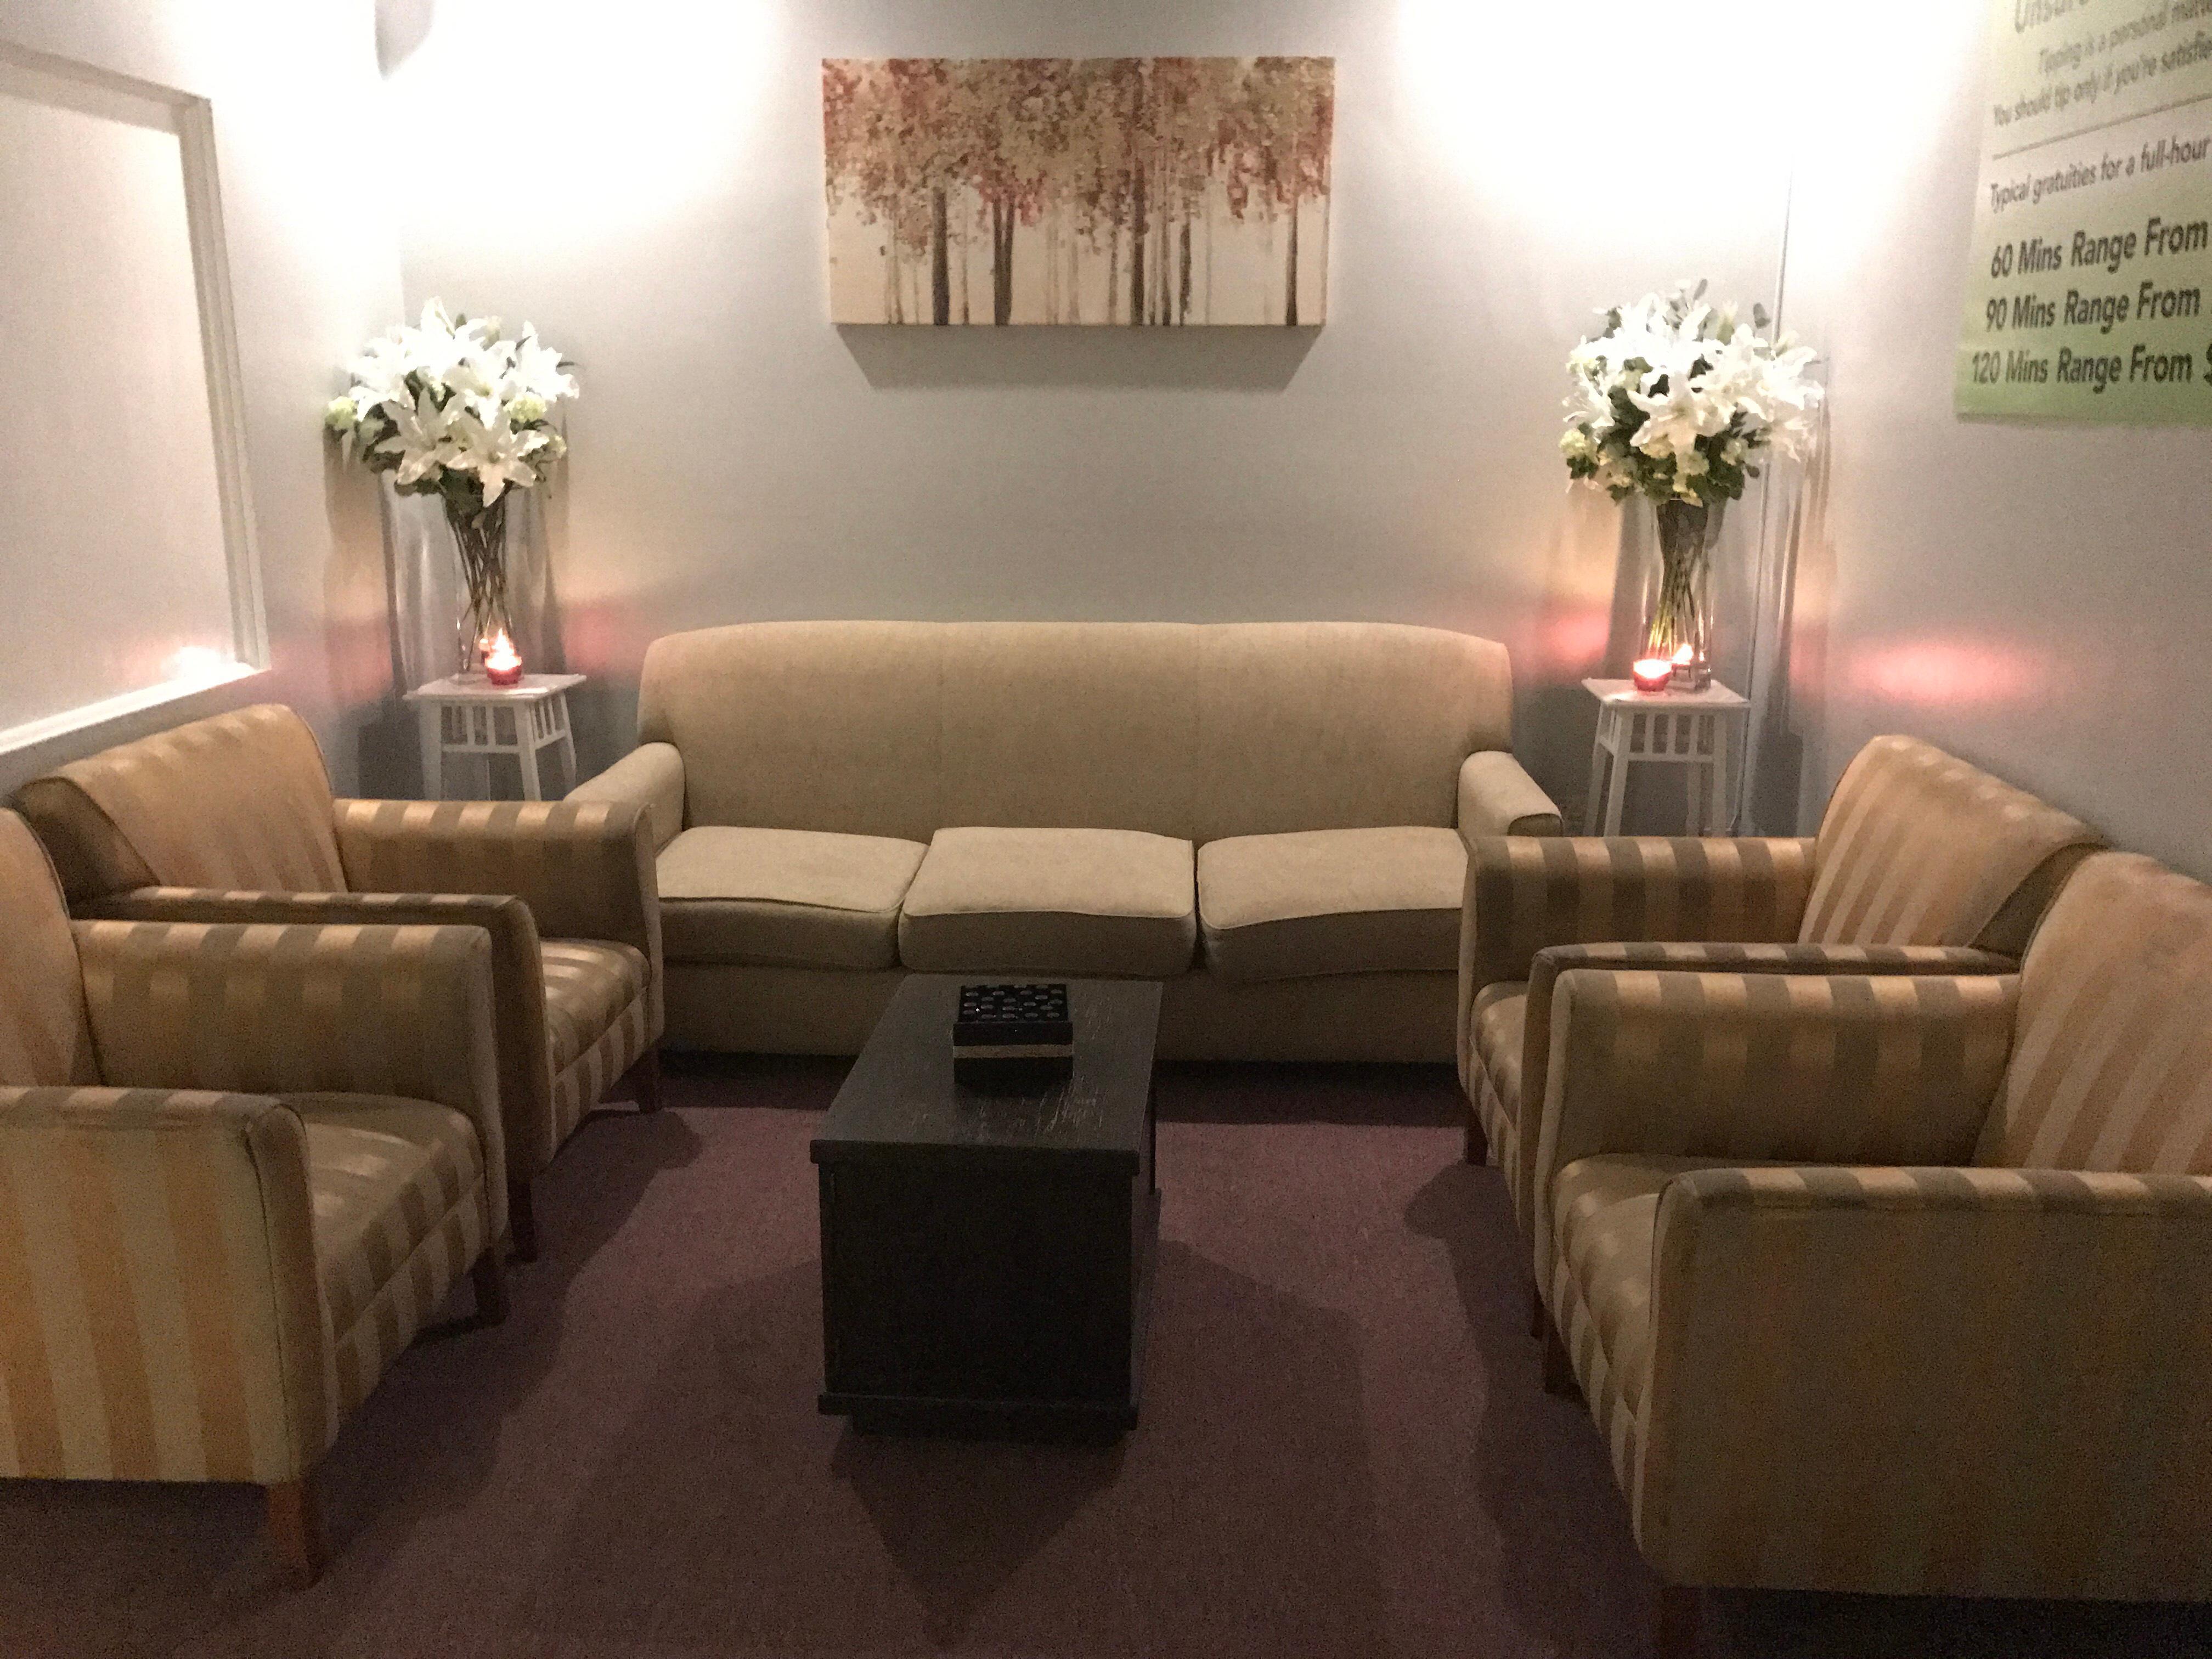 Rafole thai massage spa canoga park california ca for Academy for salon professionals canoga park